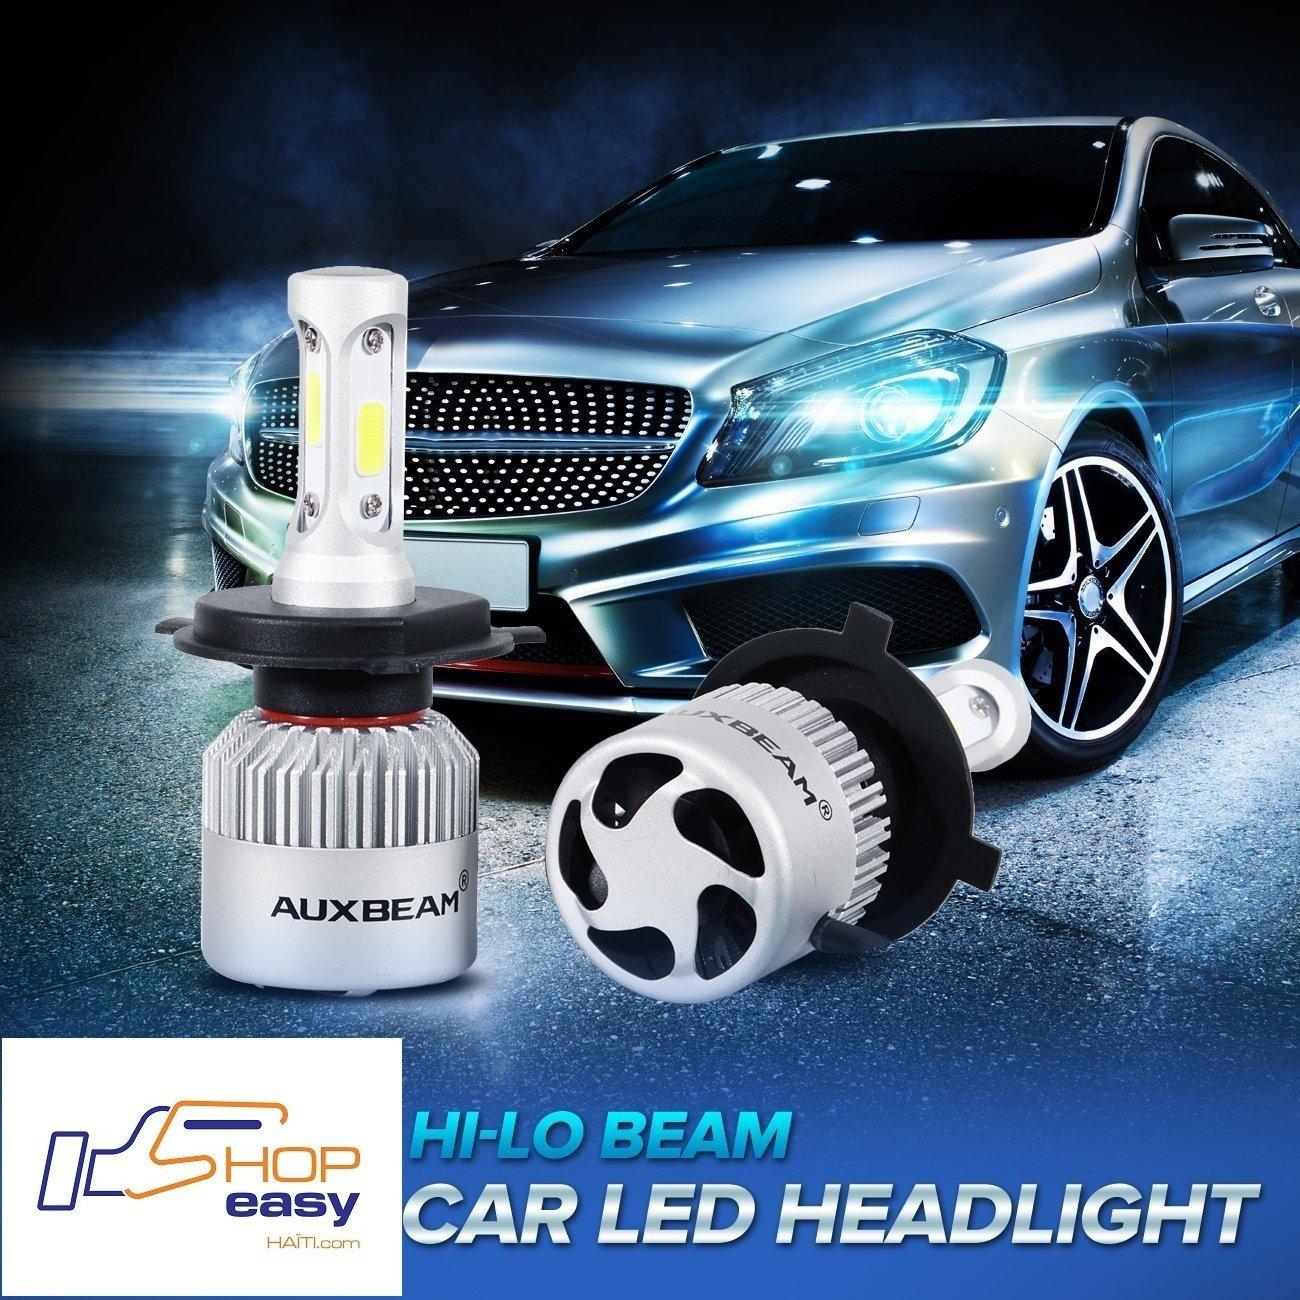 H4 C7 HeadLight Buld Lumiere Phare Vehicule (PAIRE) Ampoule UNIVERSELLE 36W